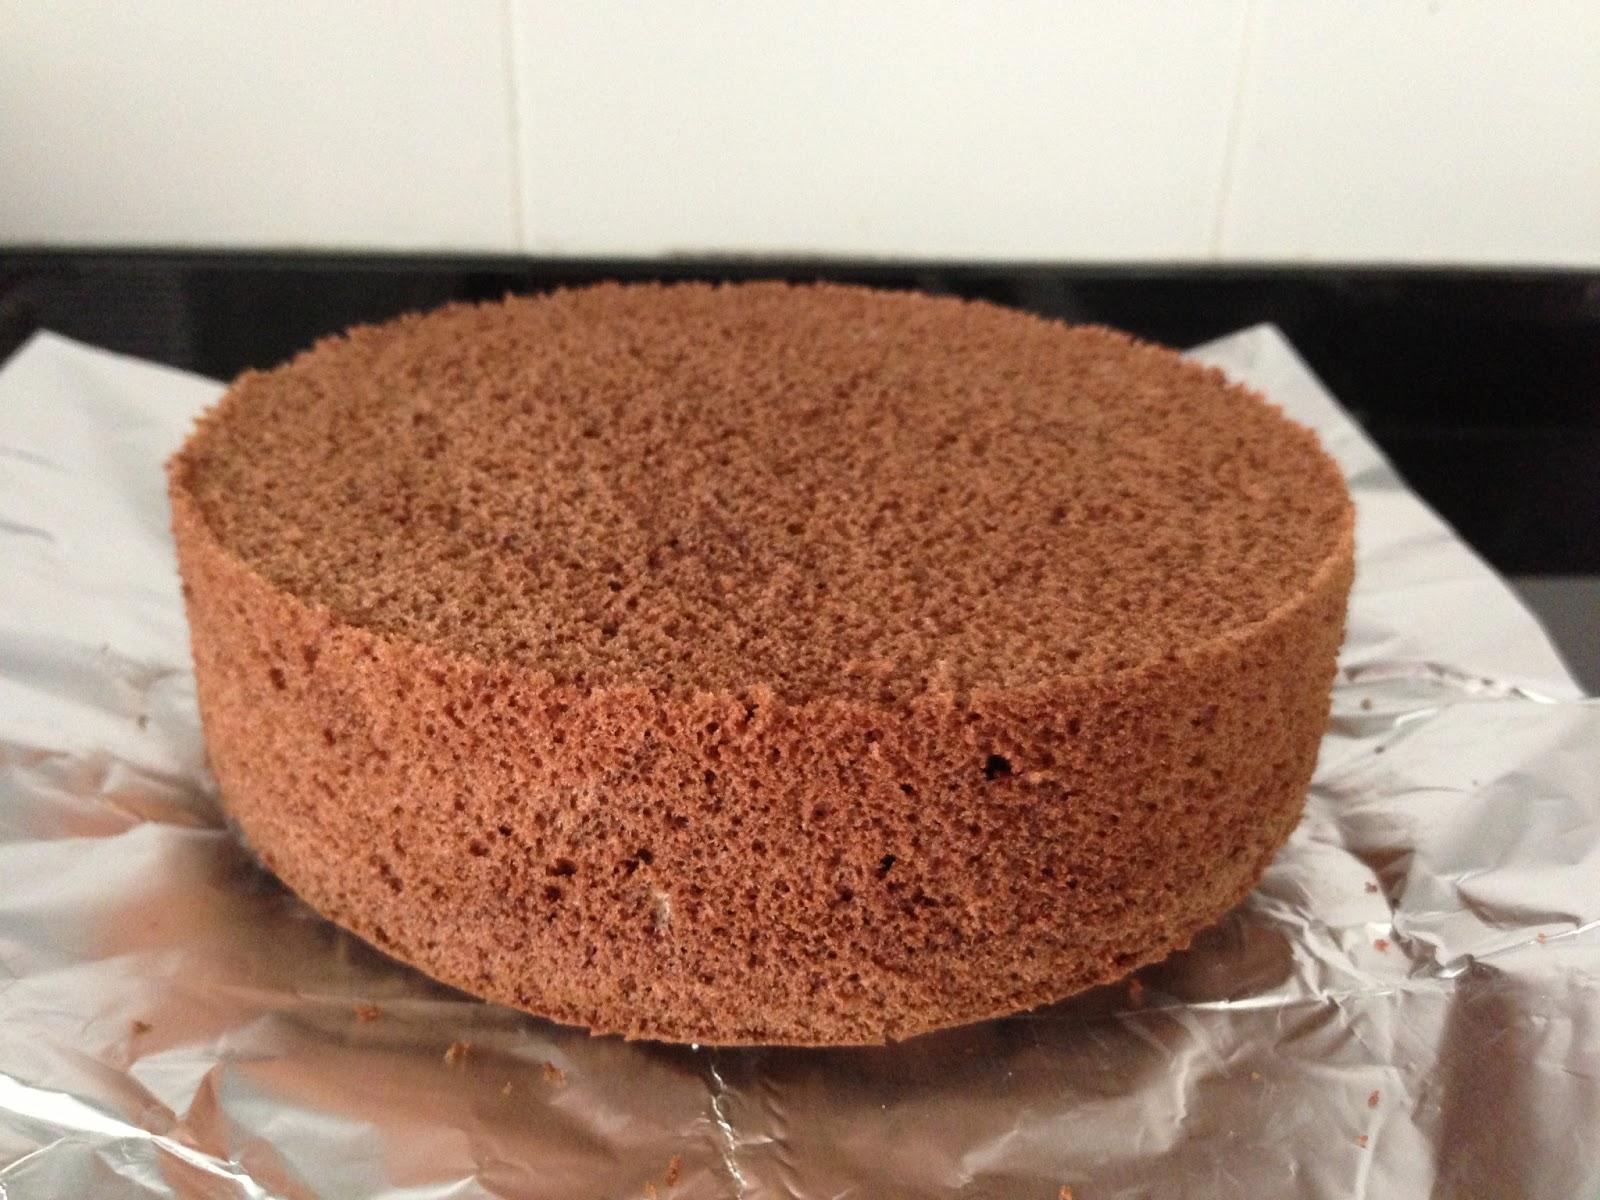 Baking Science Chocolate Sponge Cake